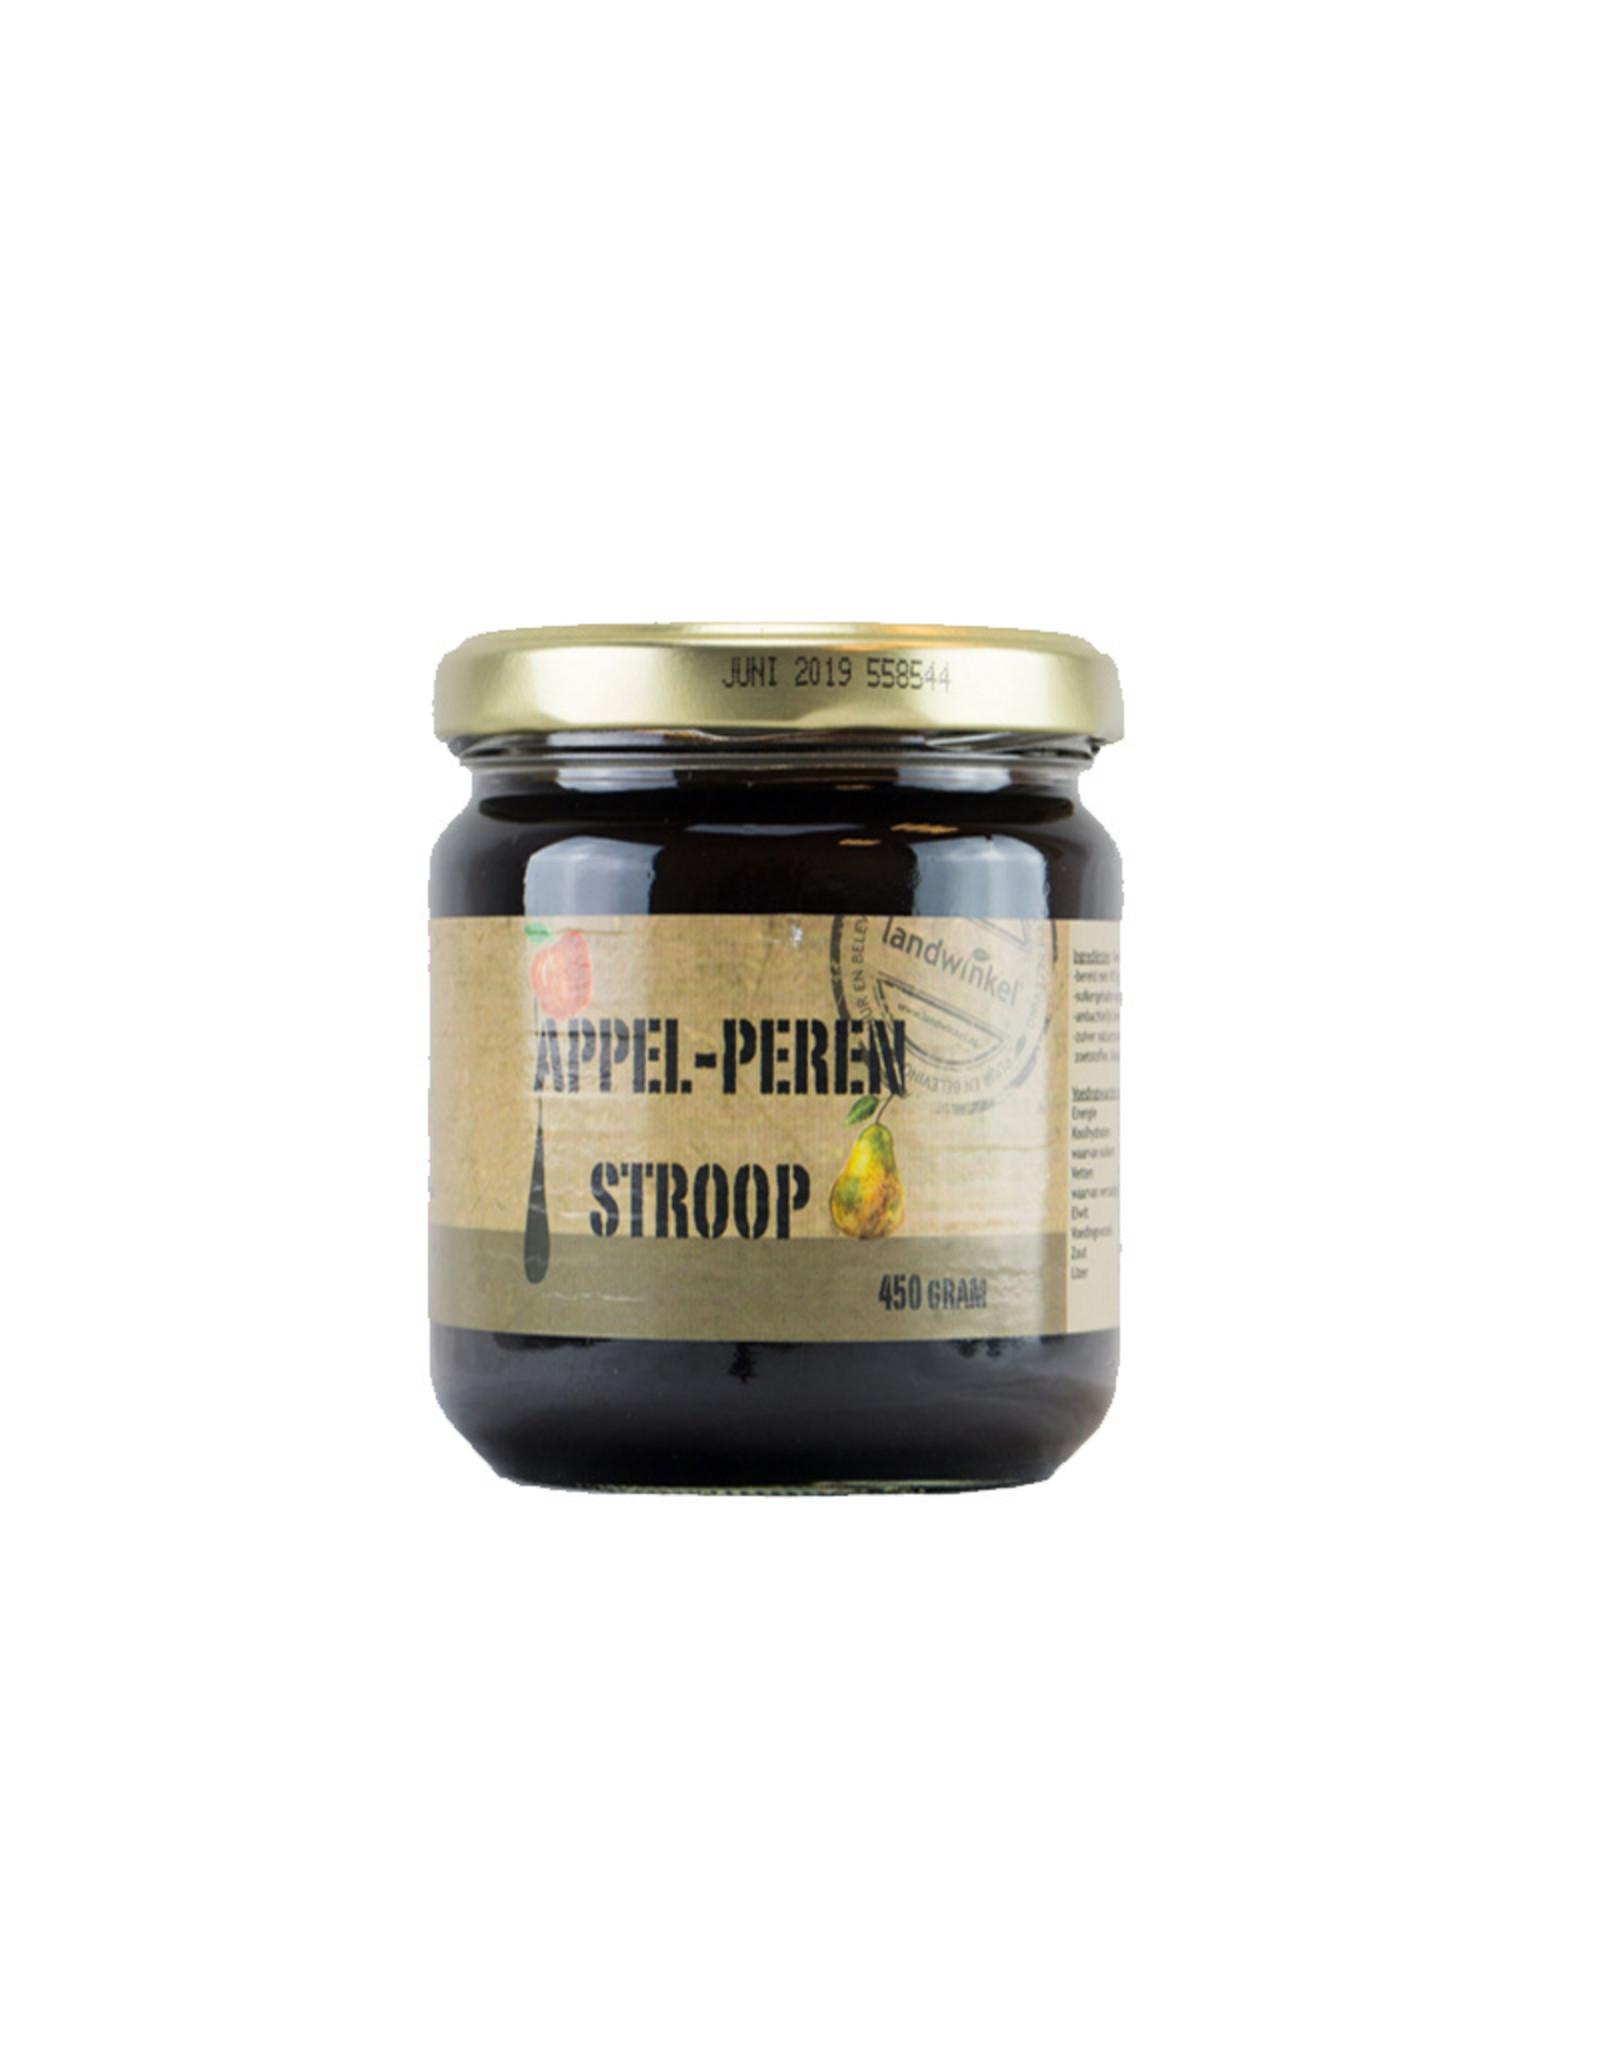 Landwinkel Appel perenstroop 450 gr